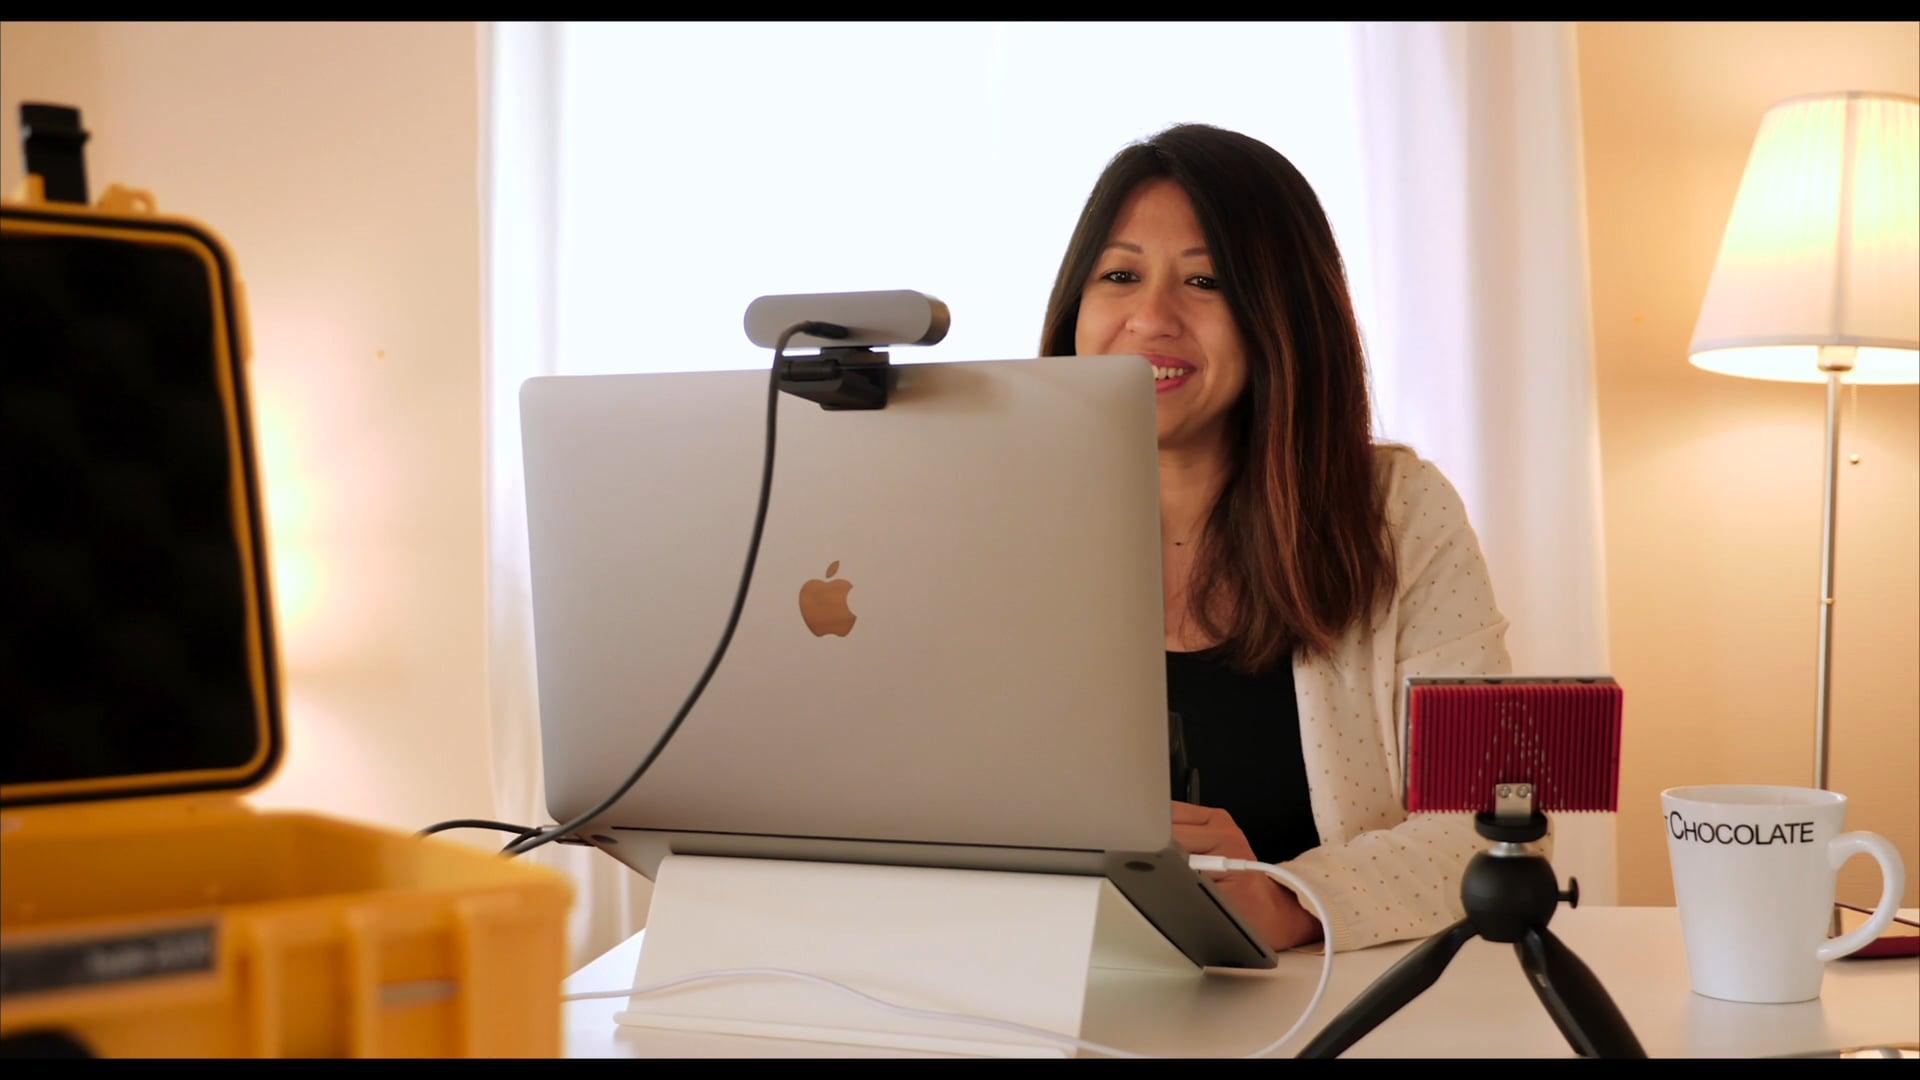 WEBINAR - Unboxing du kit webcam